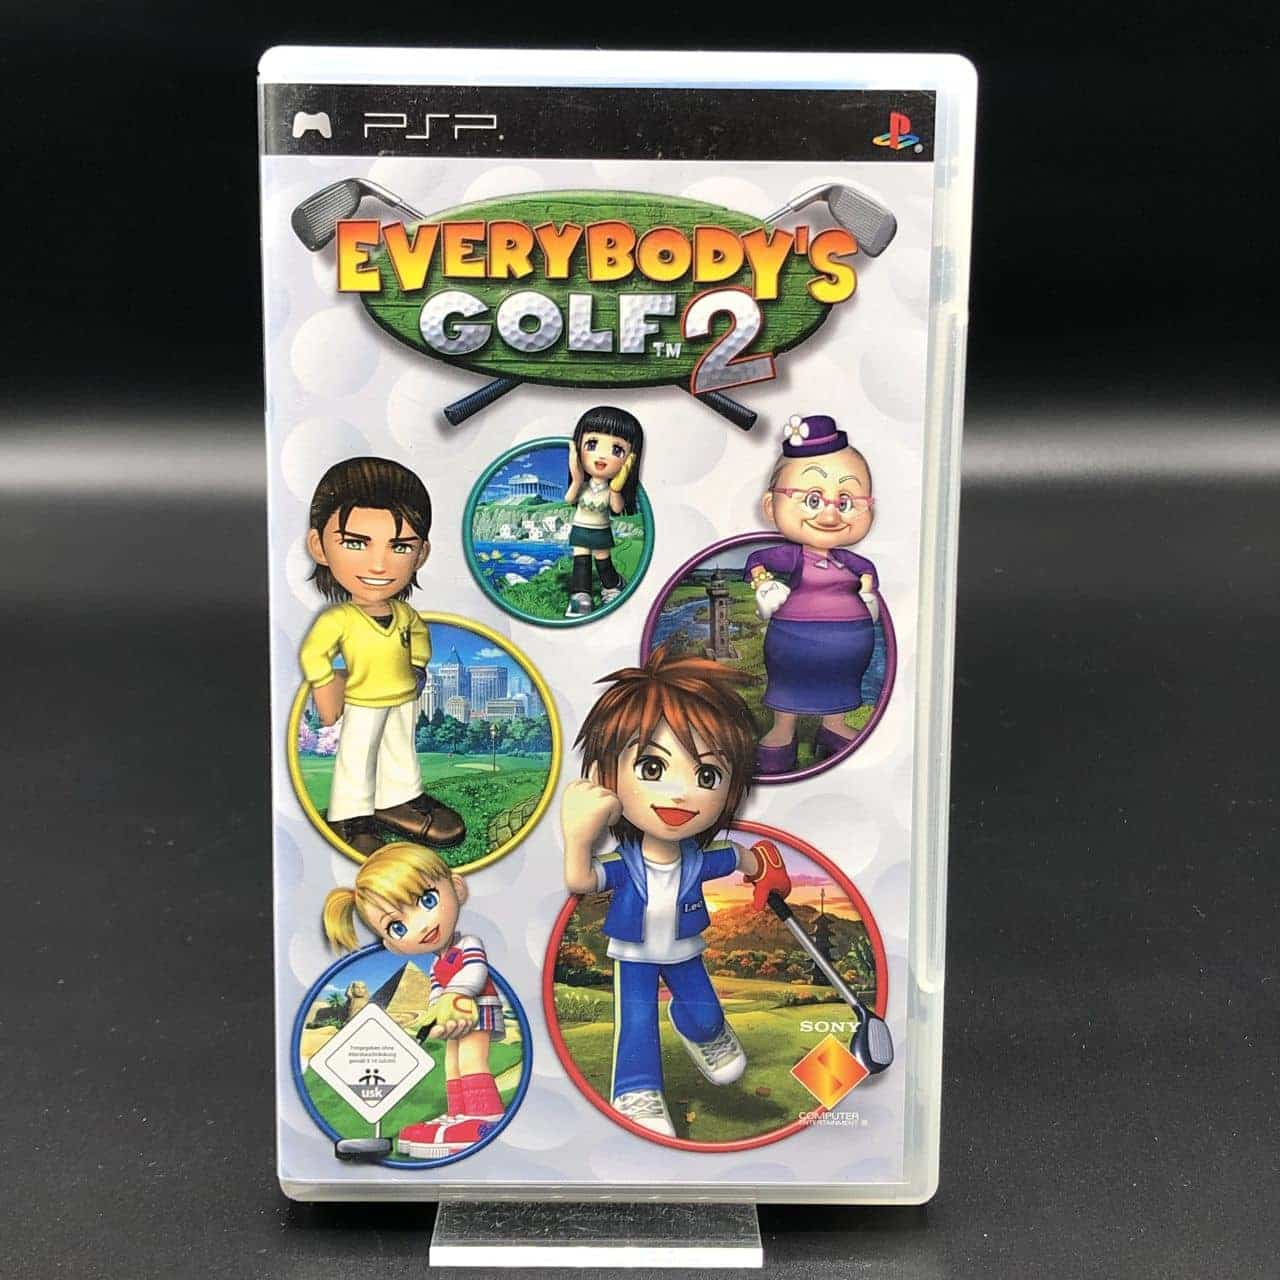 PSP Everybody's Golf 2 (Komplett) (Sehr gut) Sony PlayStation Portable